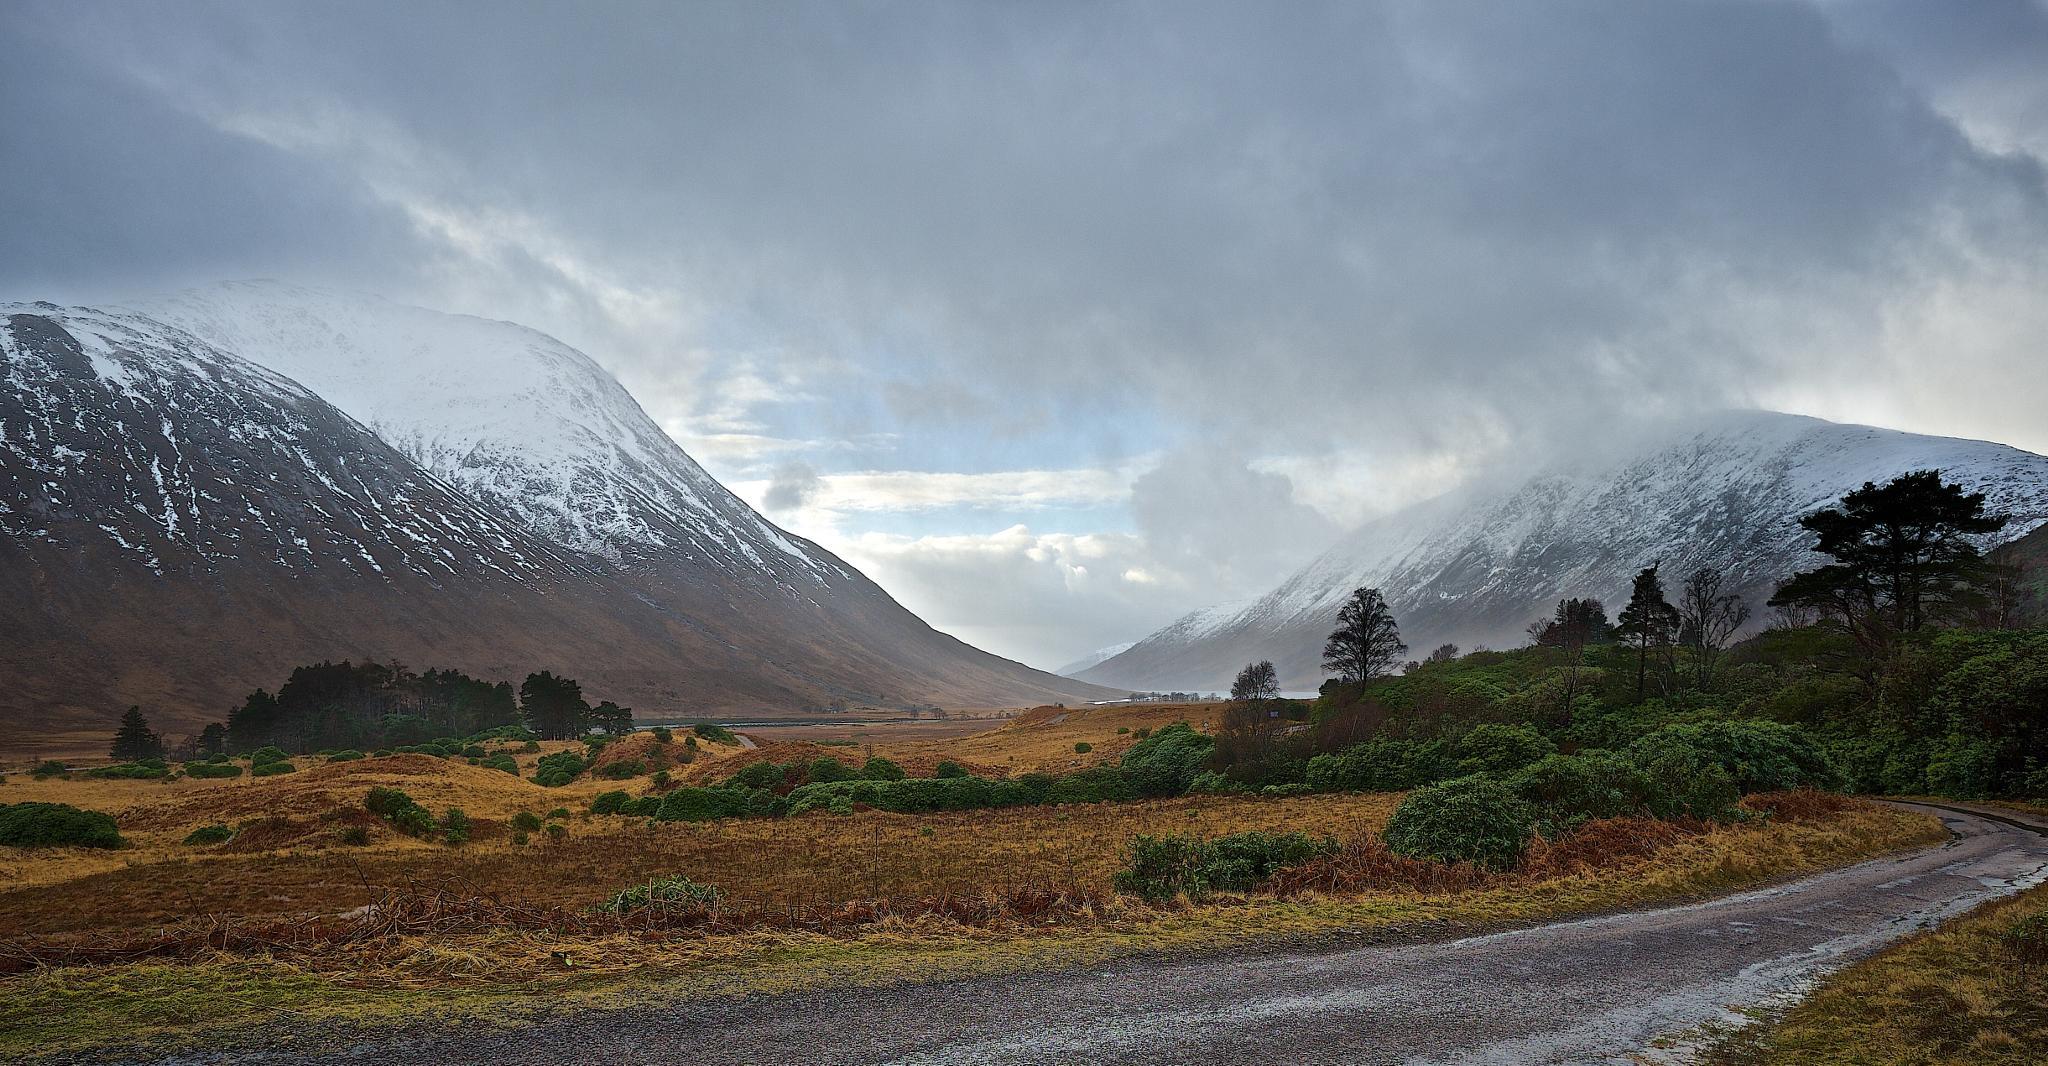 Looking Towards Loch Etive by dundeedavie